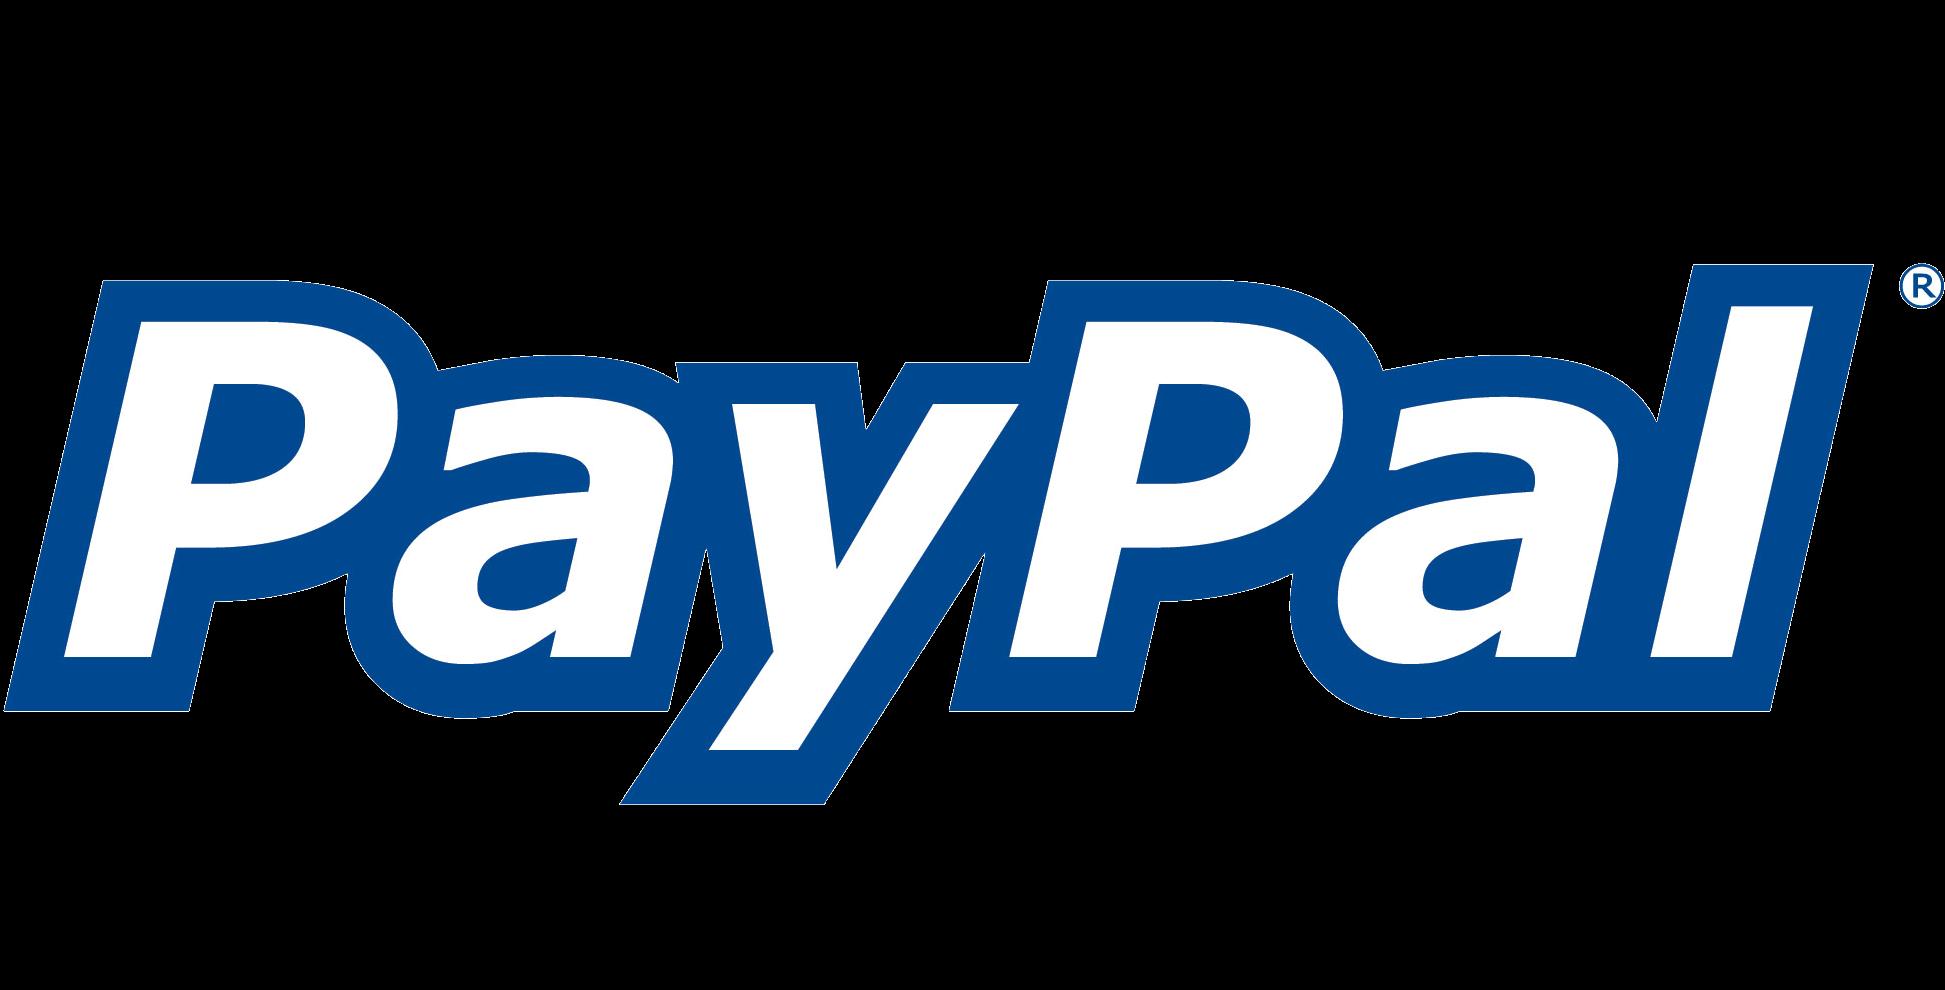 Paypal Logo Png - Paypal, Transparent background PNG HD thumbnail